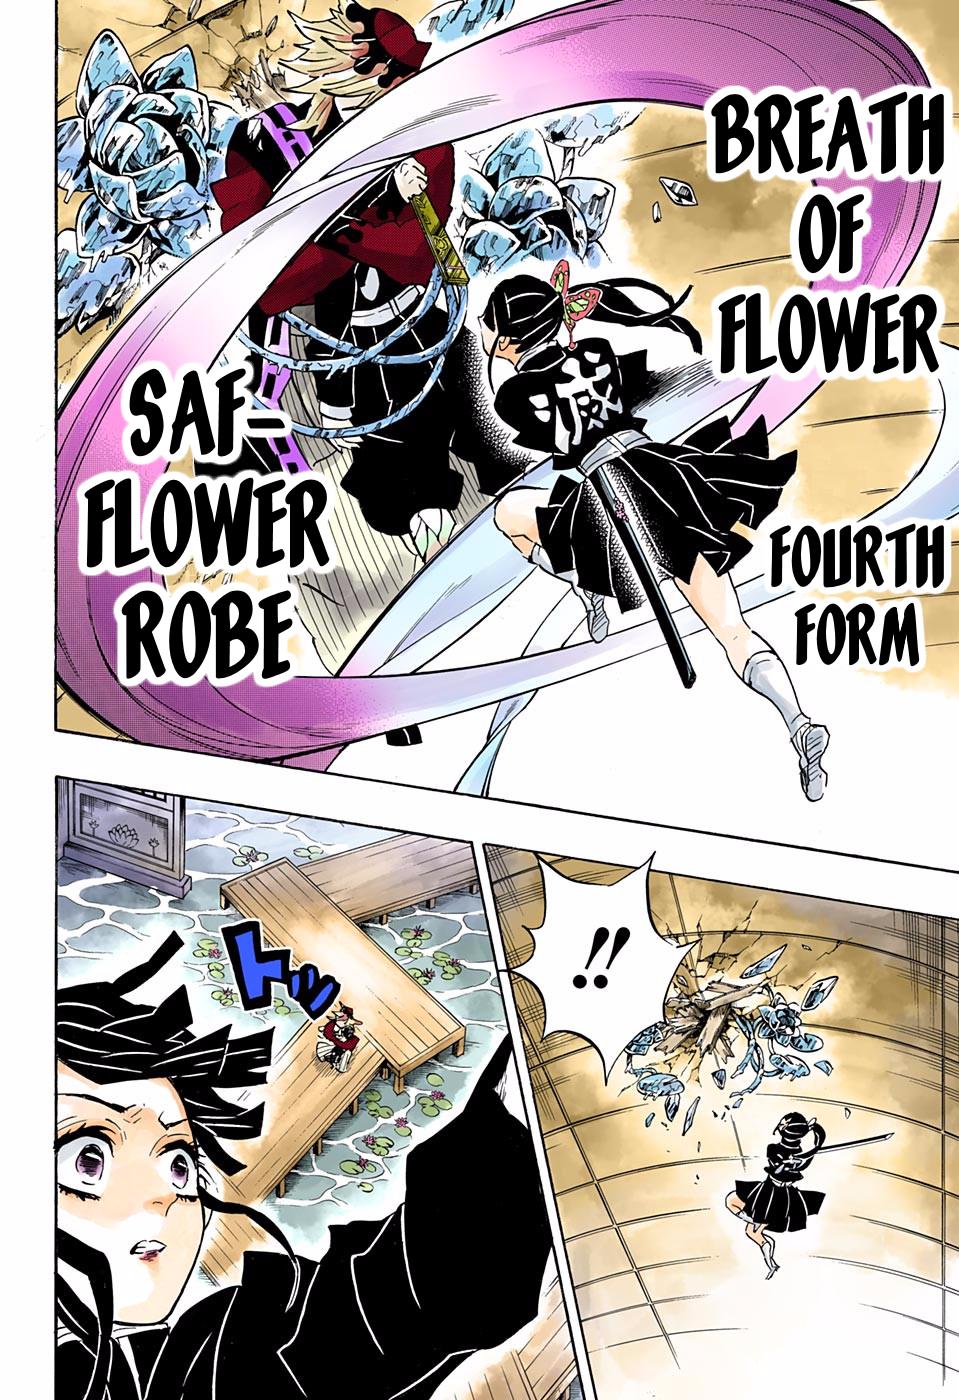 Kimetsu no Yaiba Digital Colored Comics Chapter 143 อะ